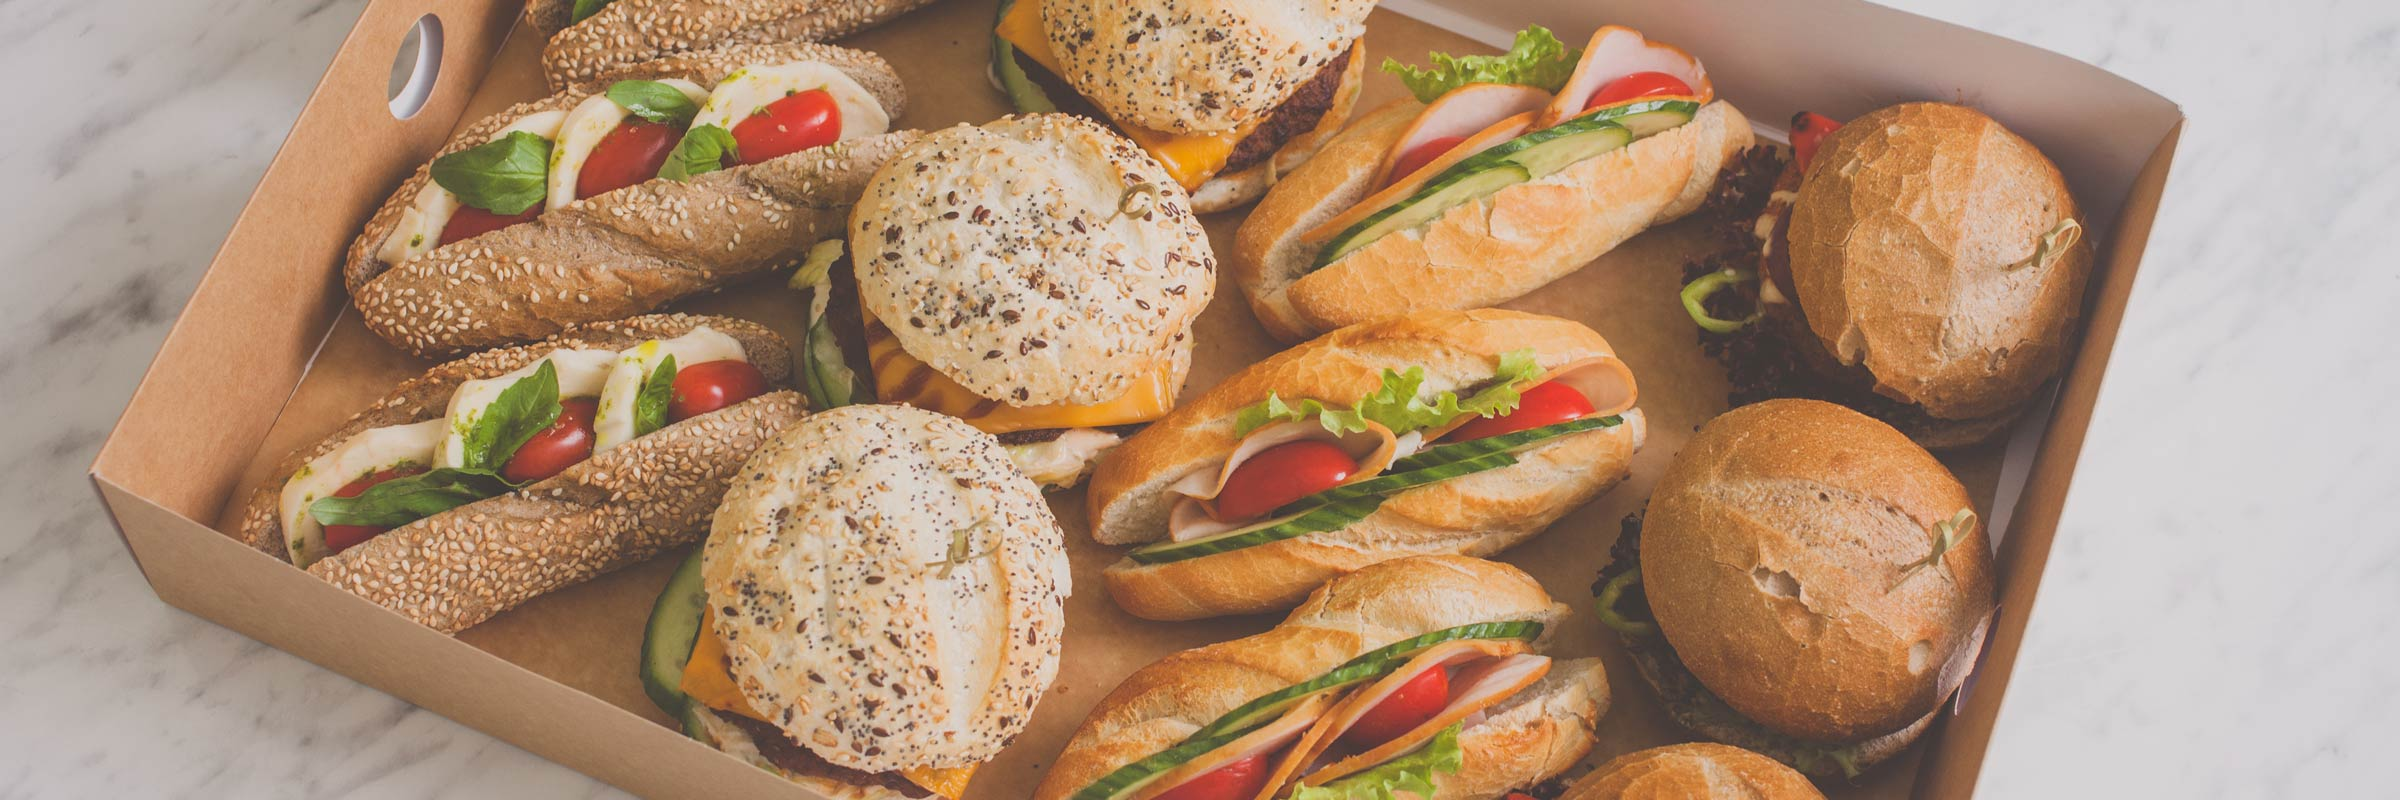 кетъринг-софия-сандвичи